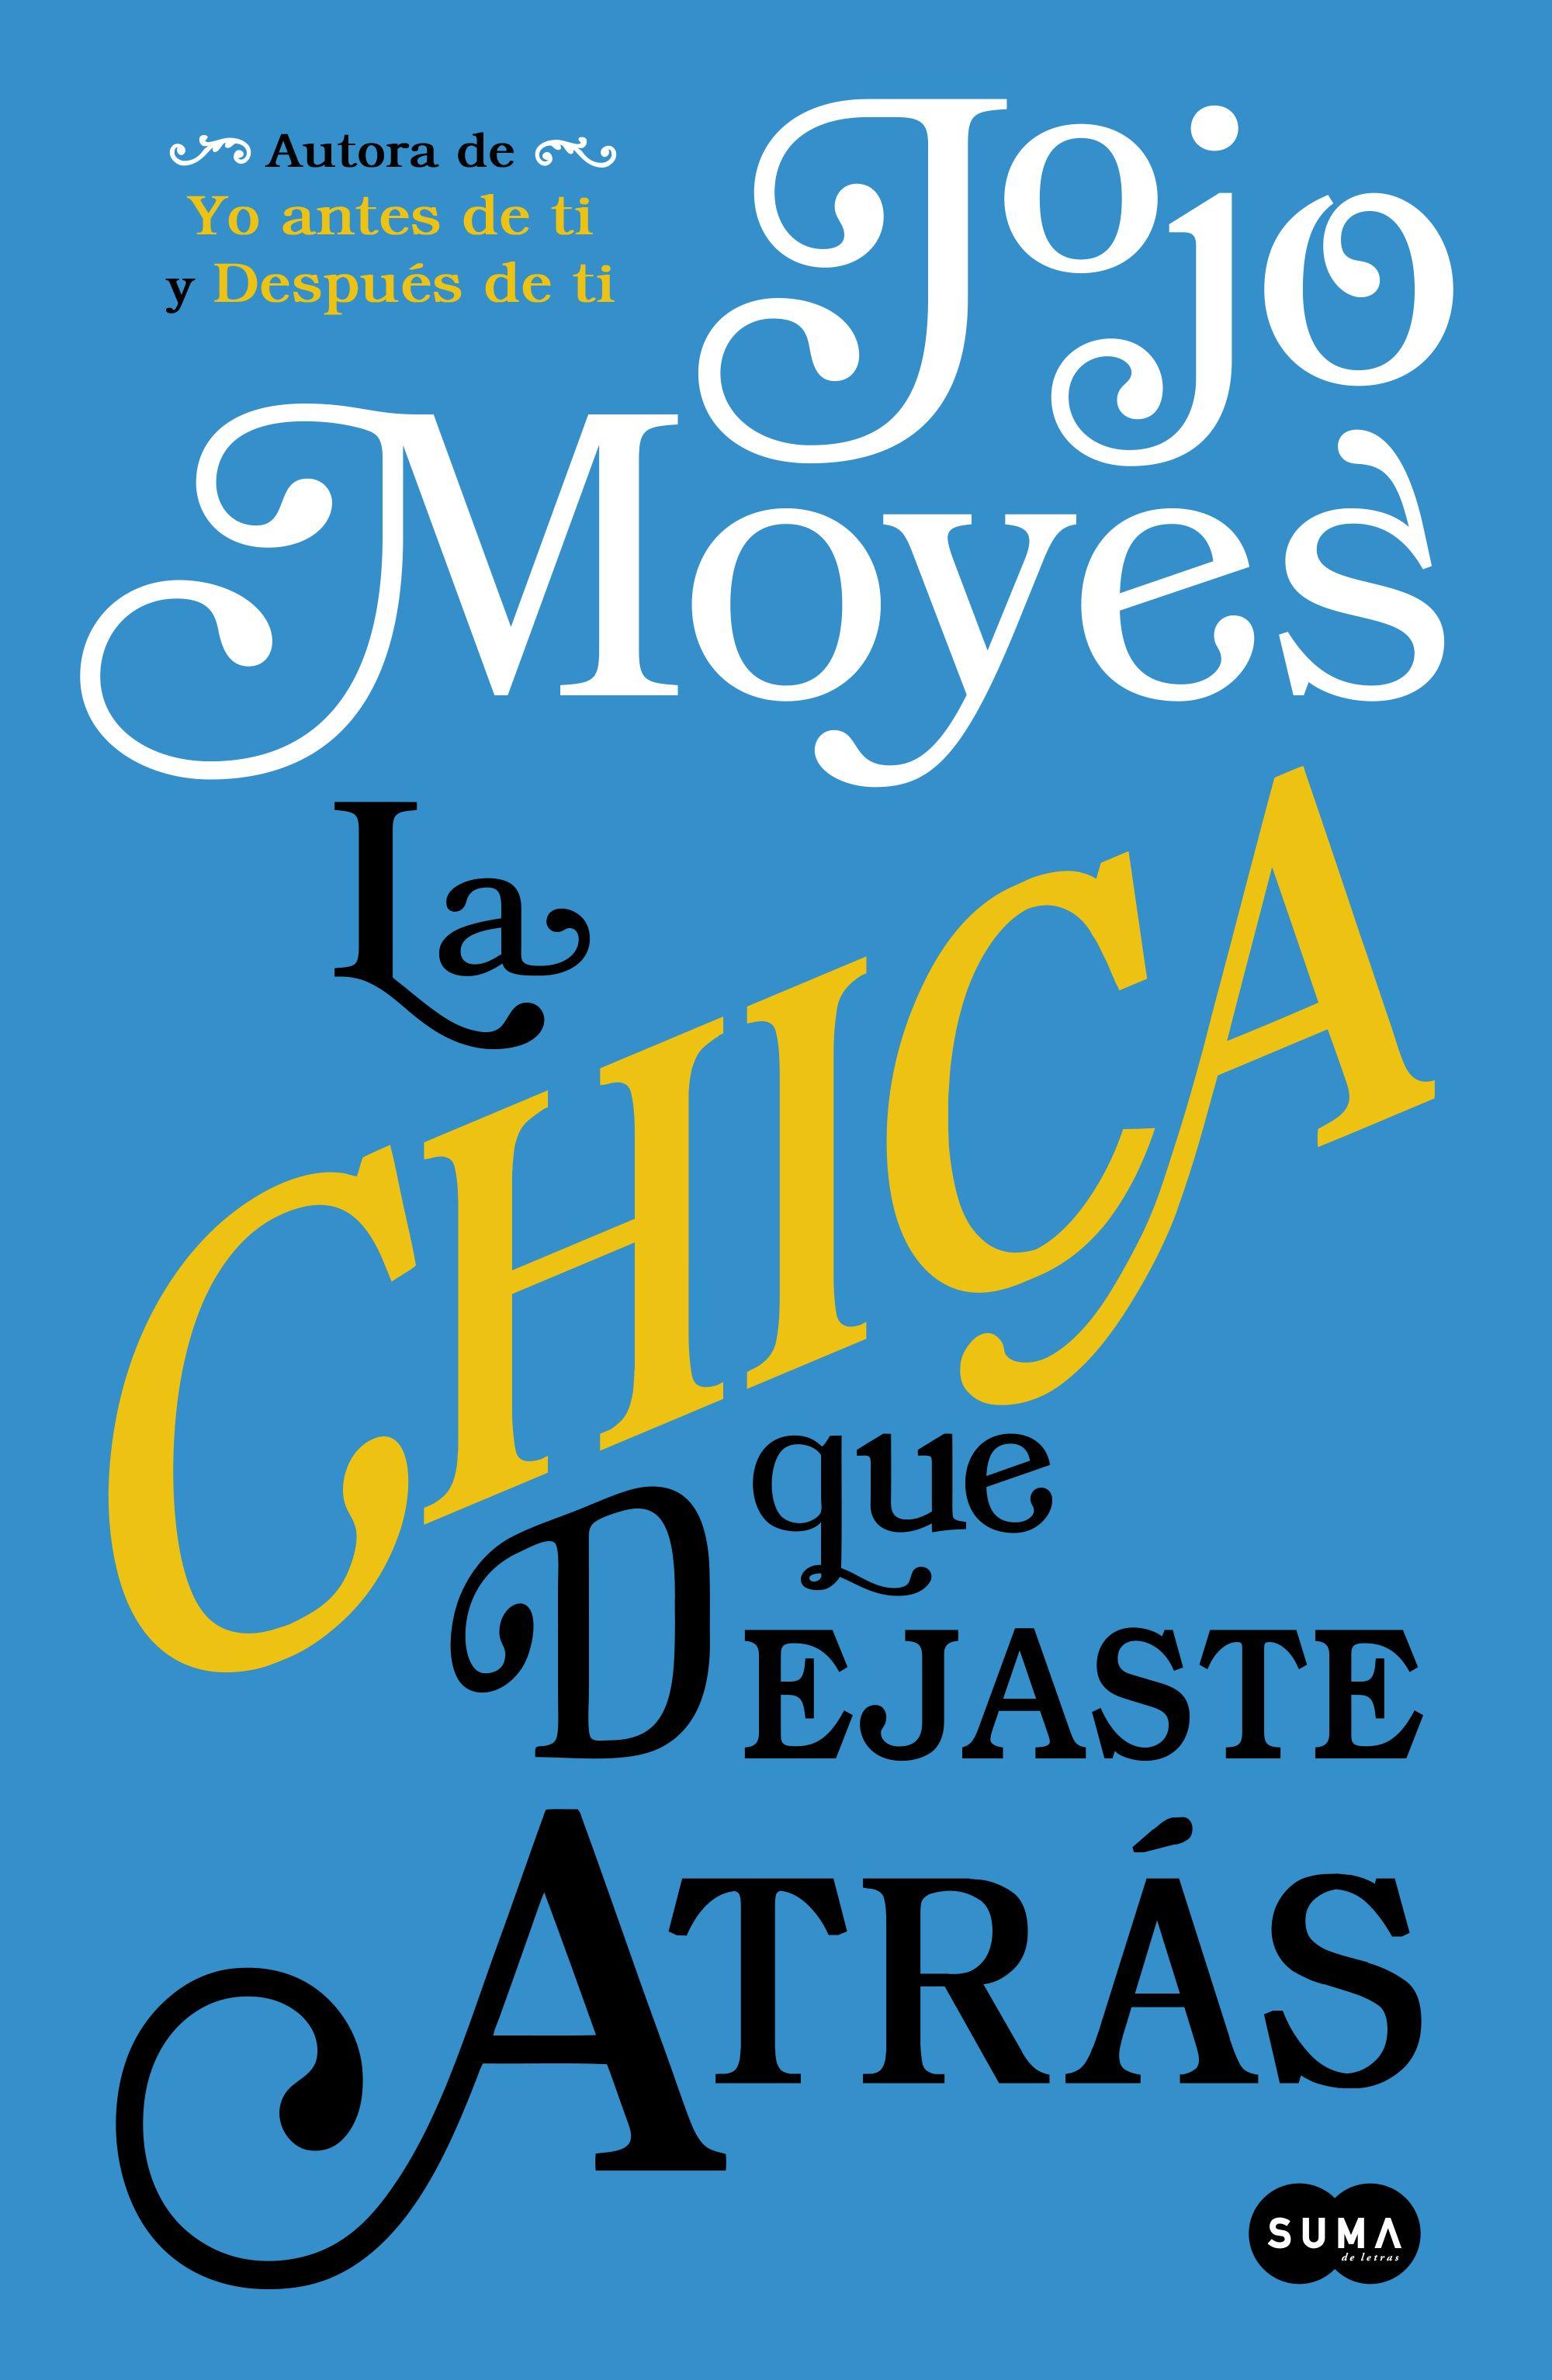 La chica que dejaste atrás, Jojo Moyes: